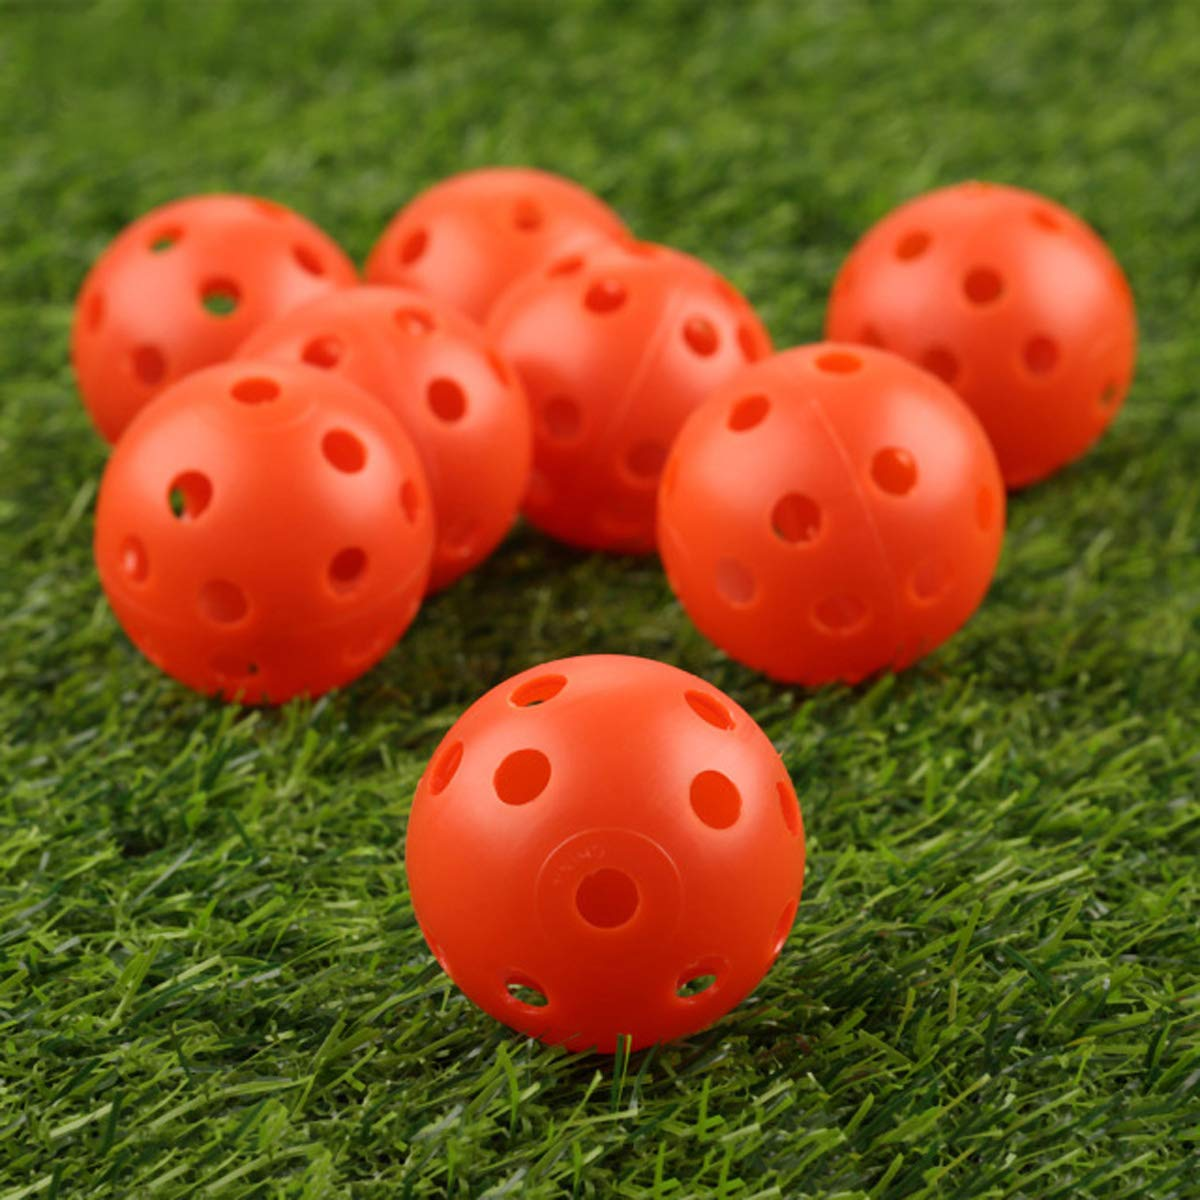 Amazon.com: Amy Sport - Pelotas de golf de plástico con ...